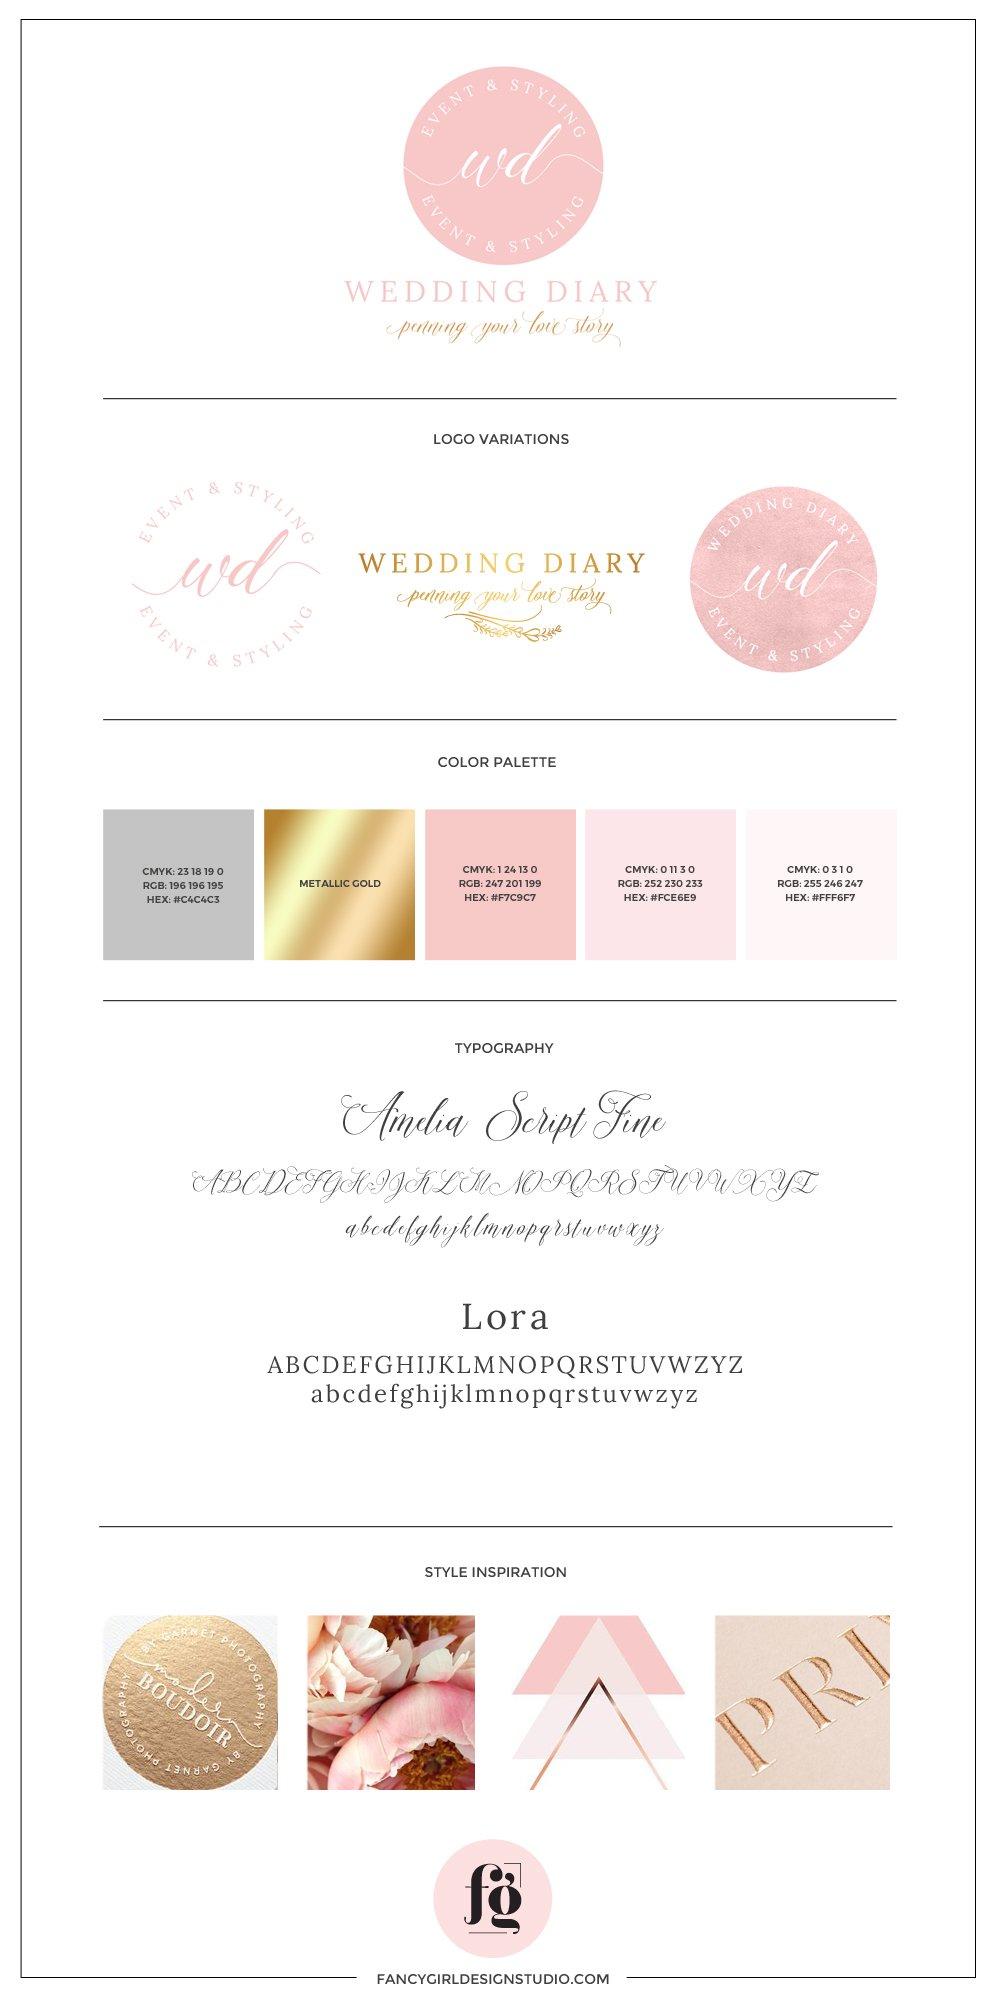 brand-board-wedding-diary-fgd